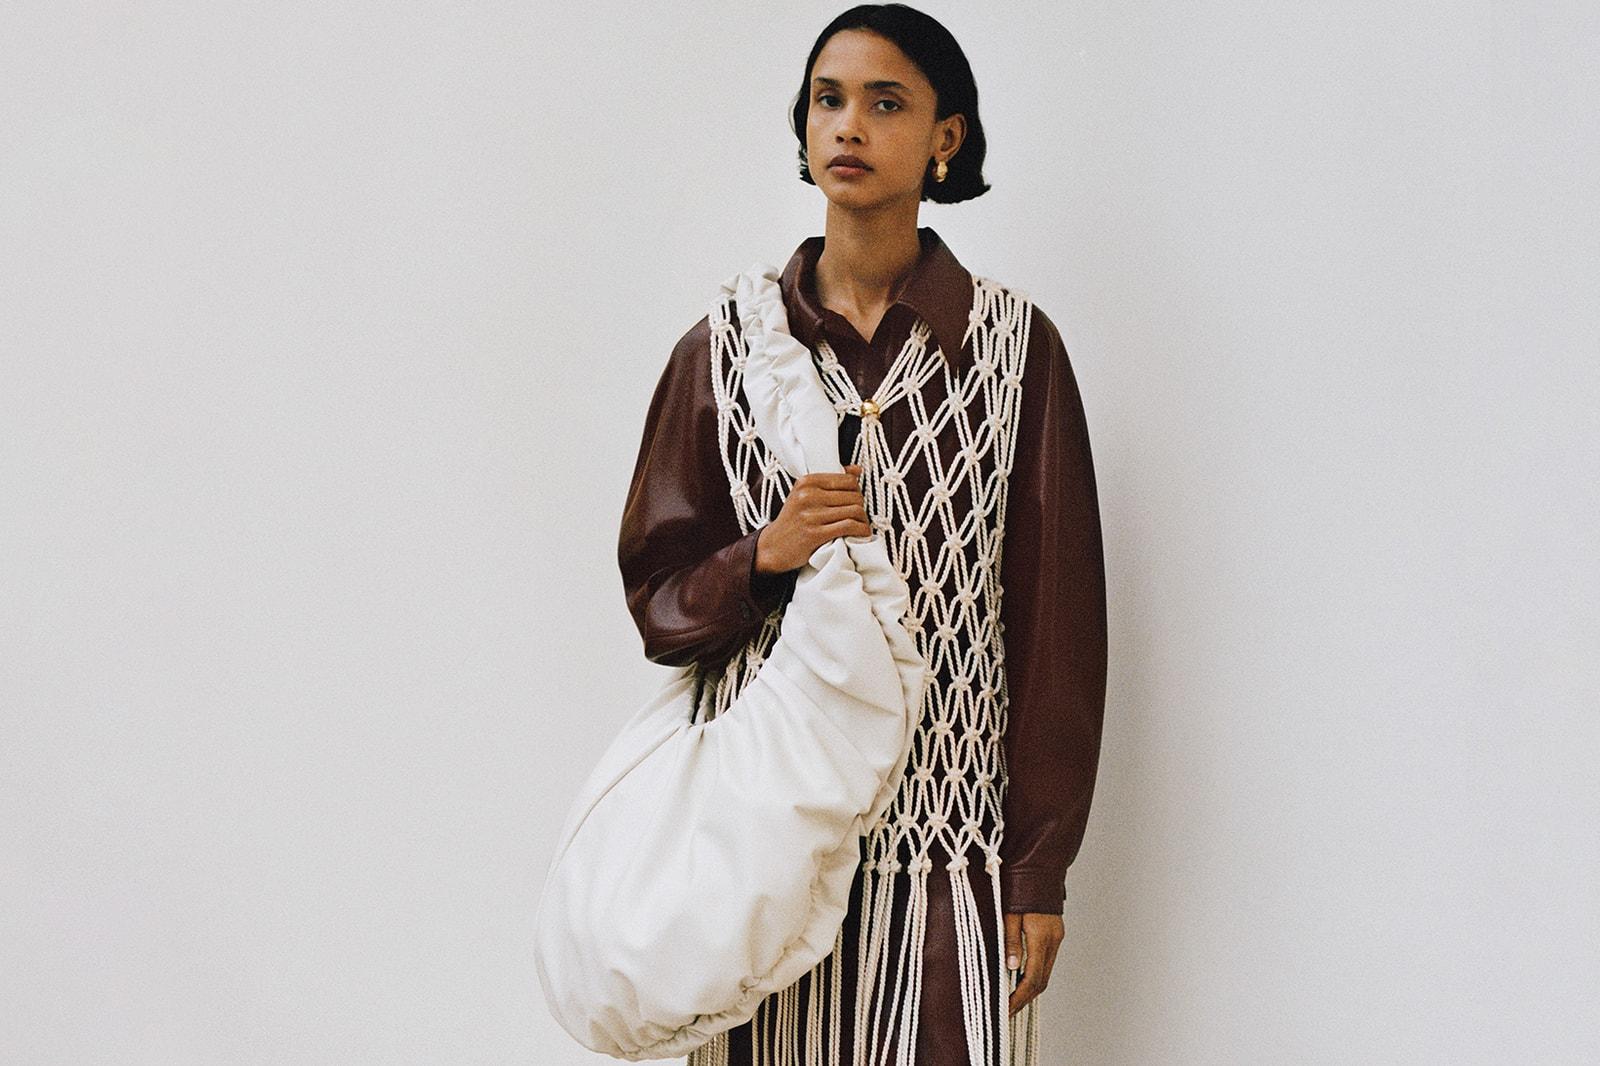 nansuhka vegan sustainable fashion fall winter 2020 resort 2021 collection lookbook Sandra Sandor